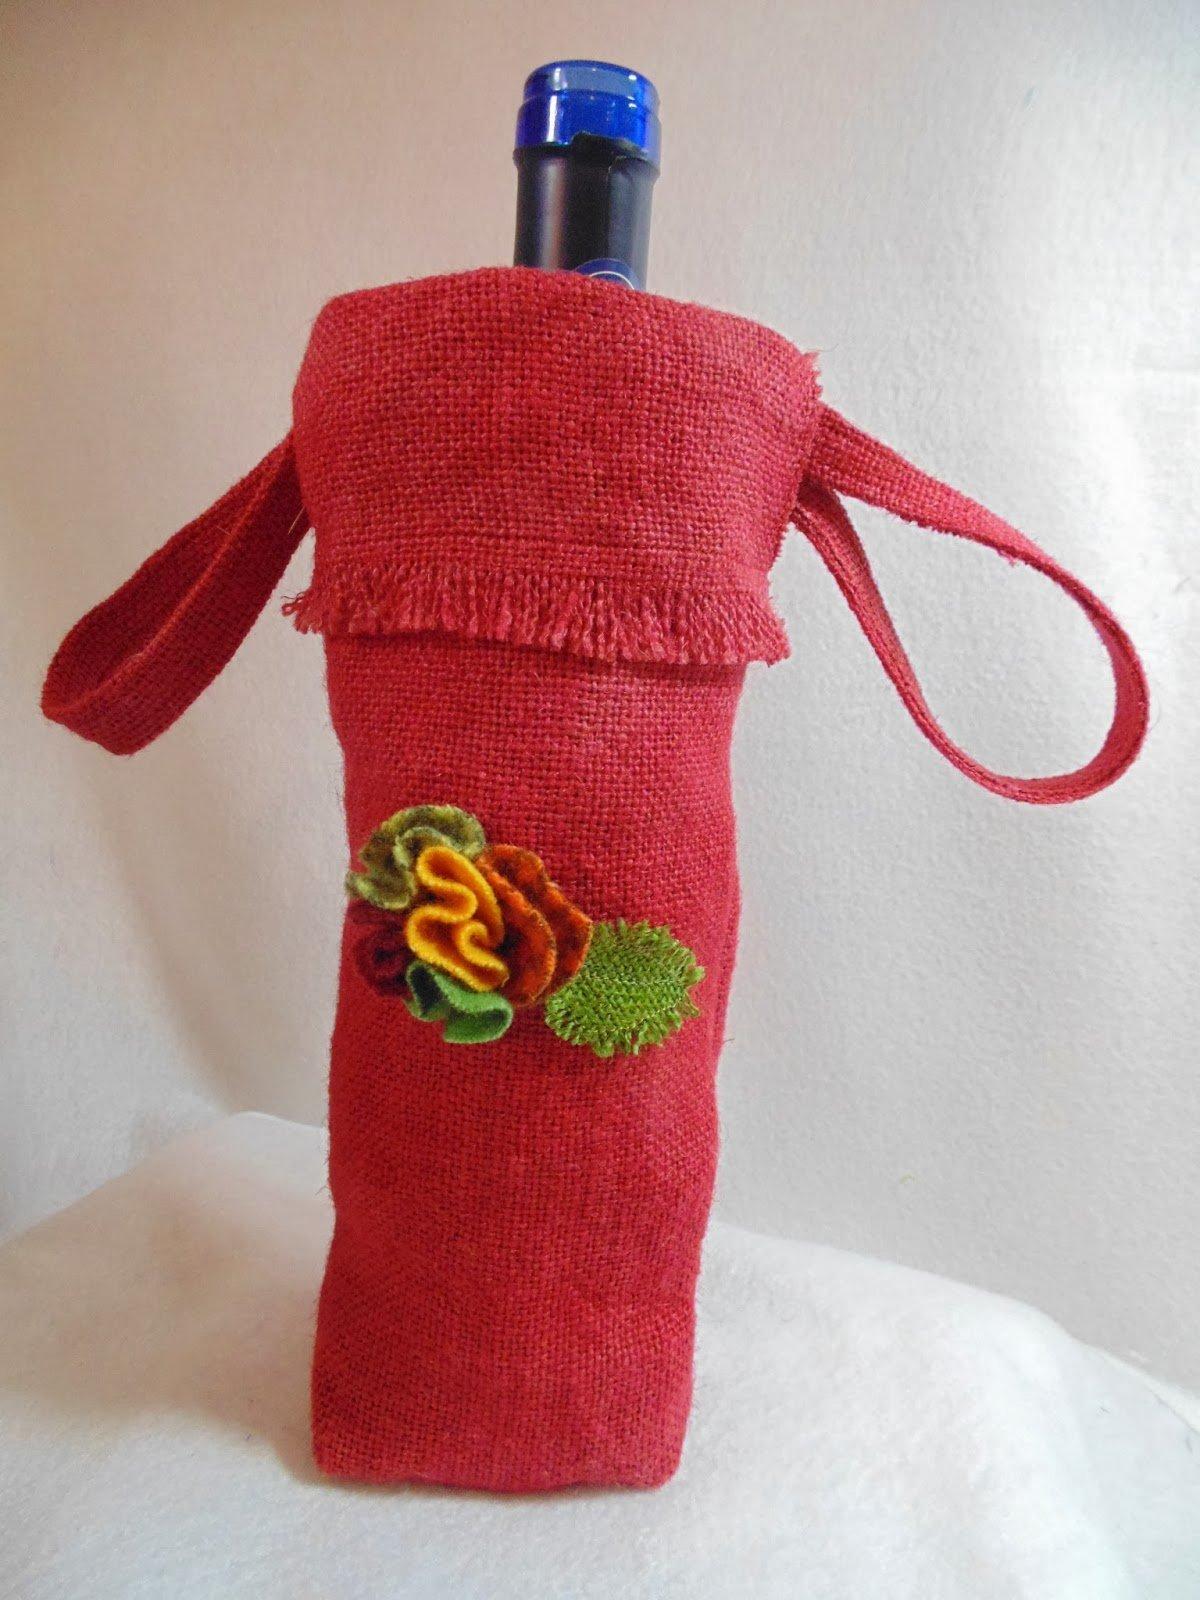 Burlap Wine Bottle Gift Bag with Wool Flower